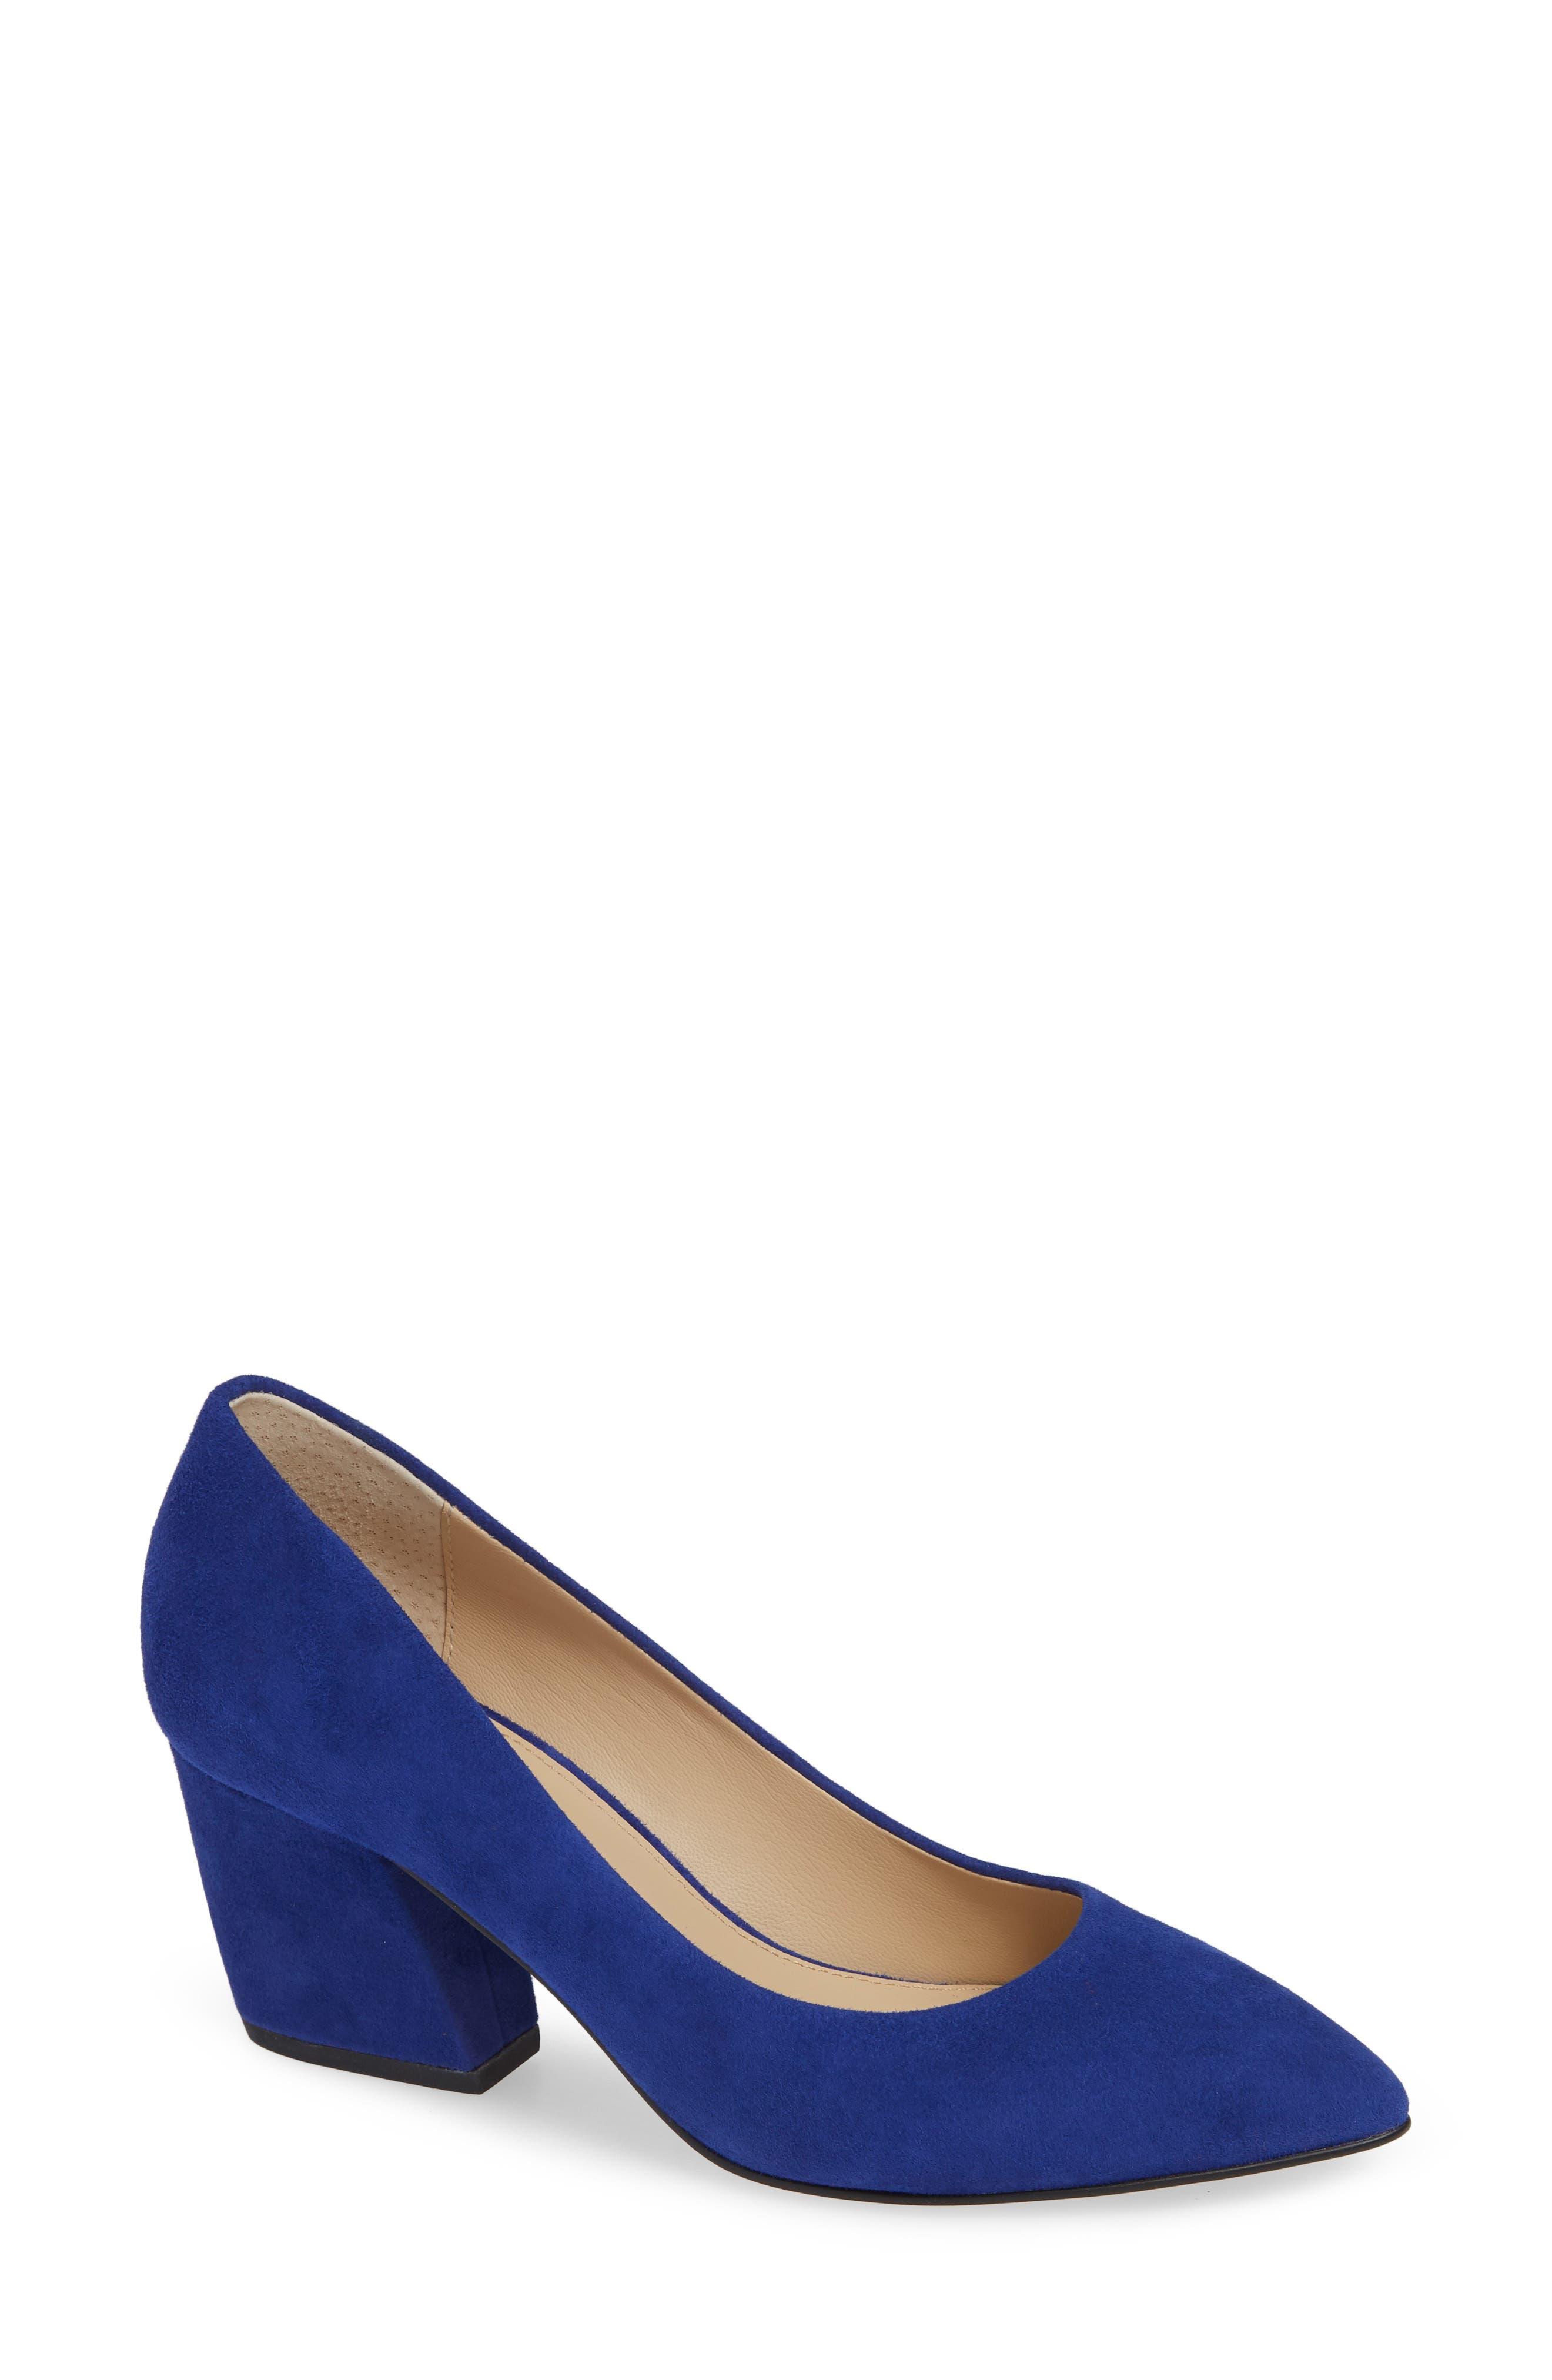 Women'S Stella Pumps in Dazzling Blue Suede